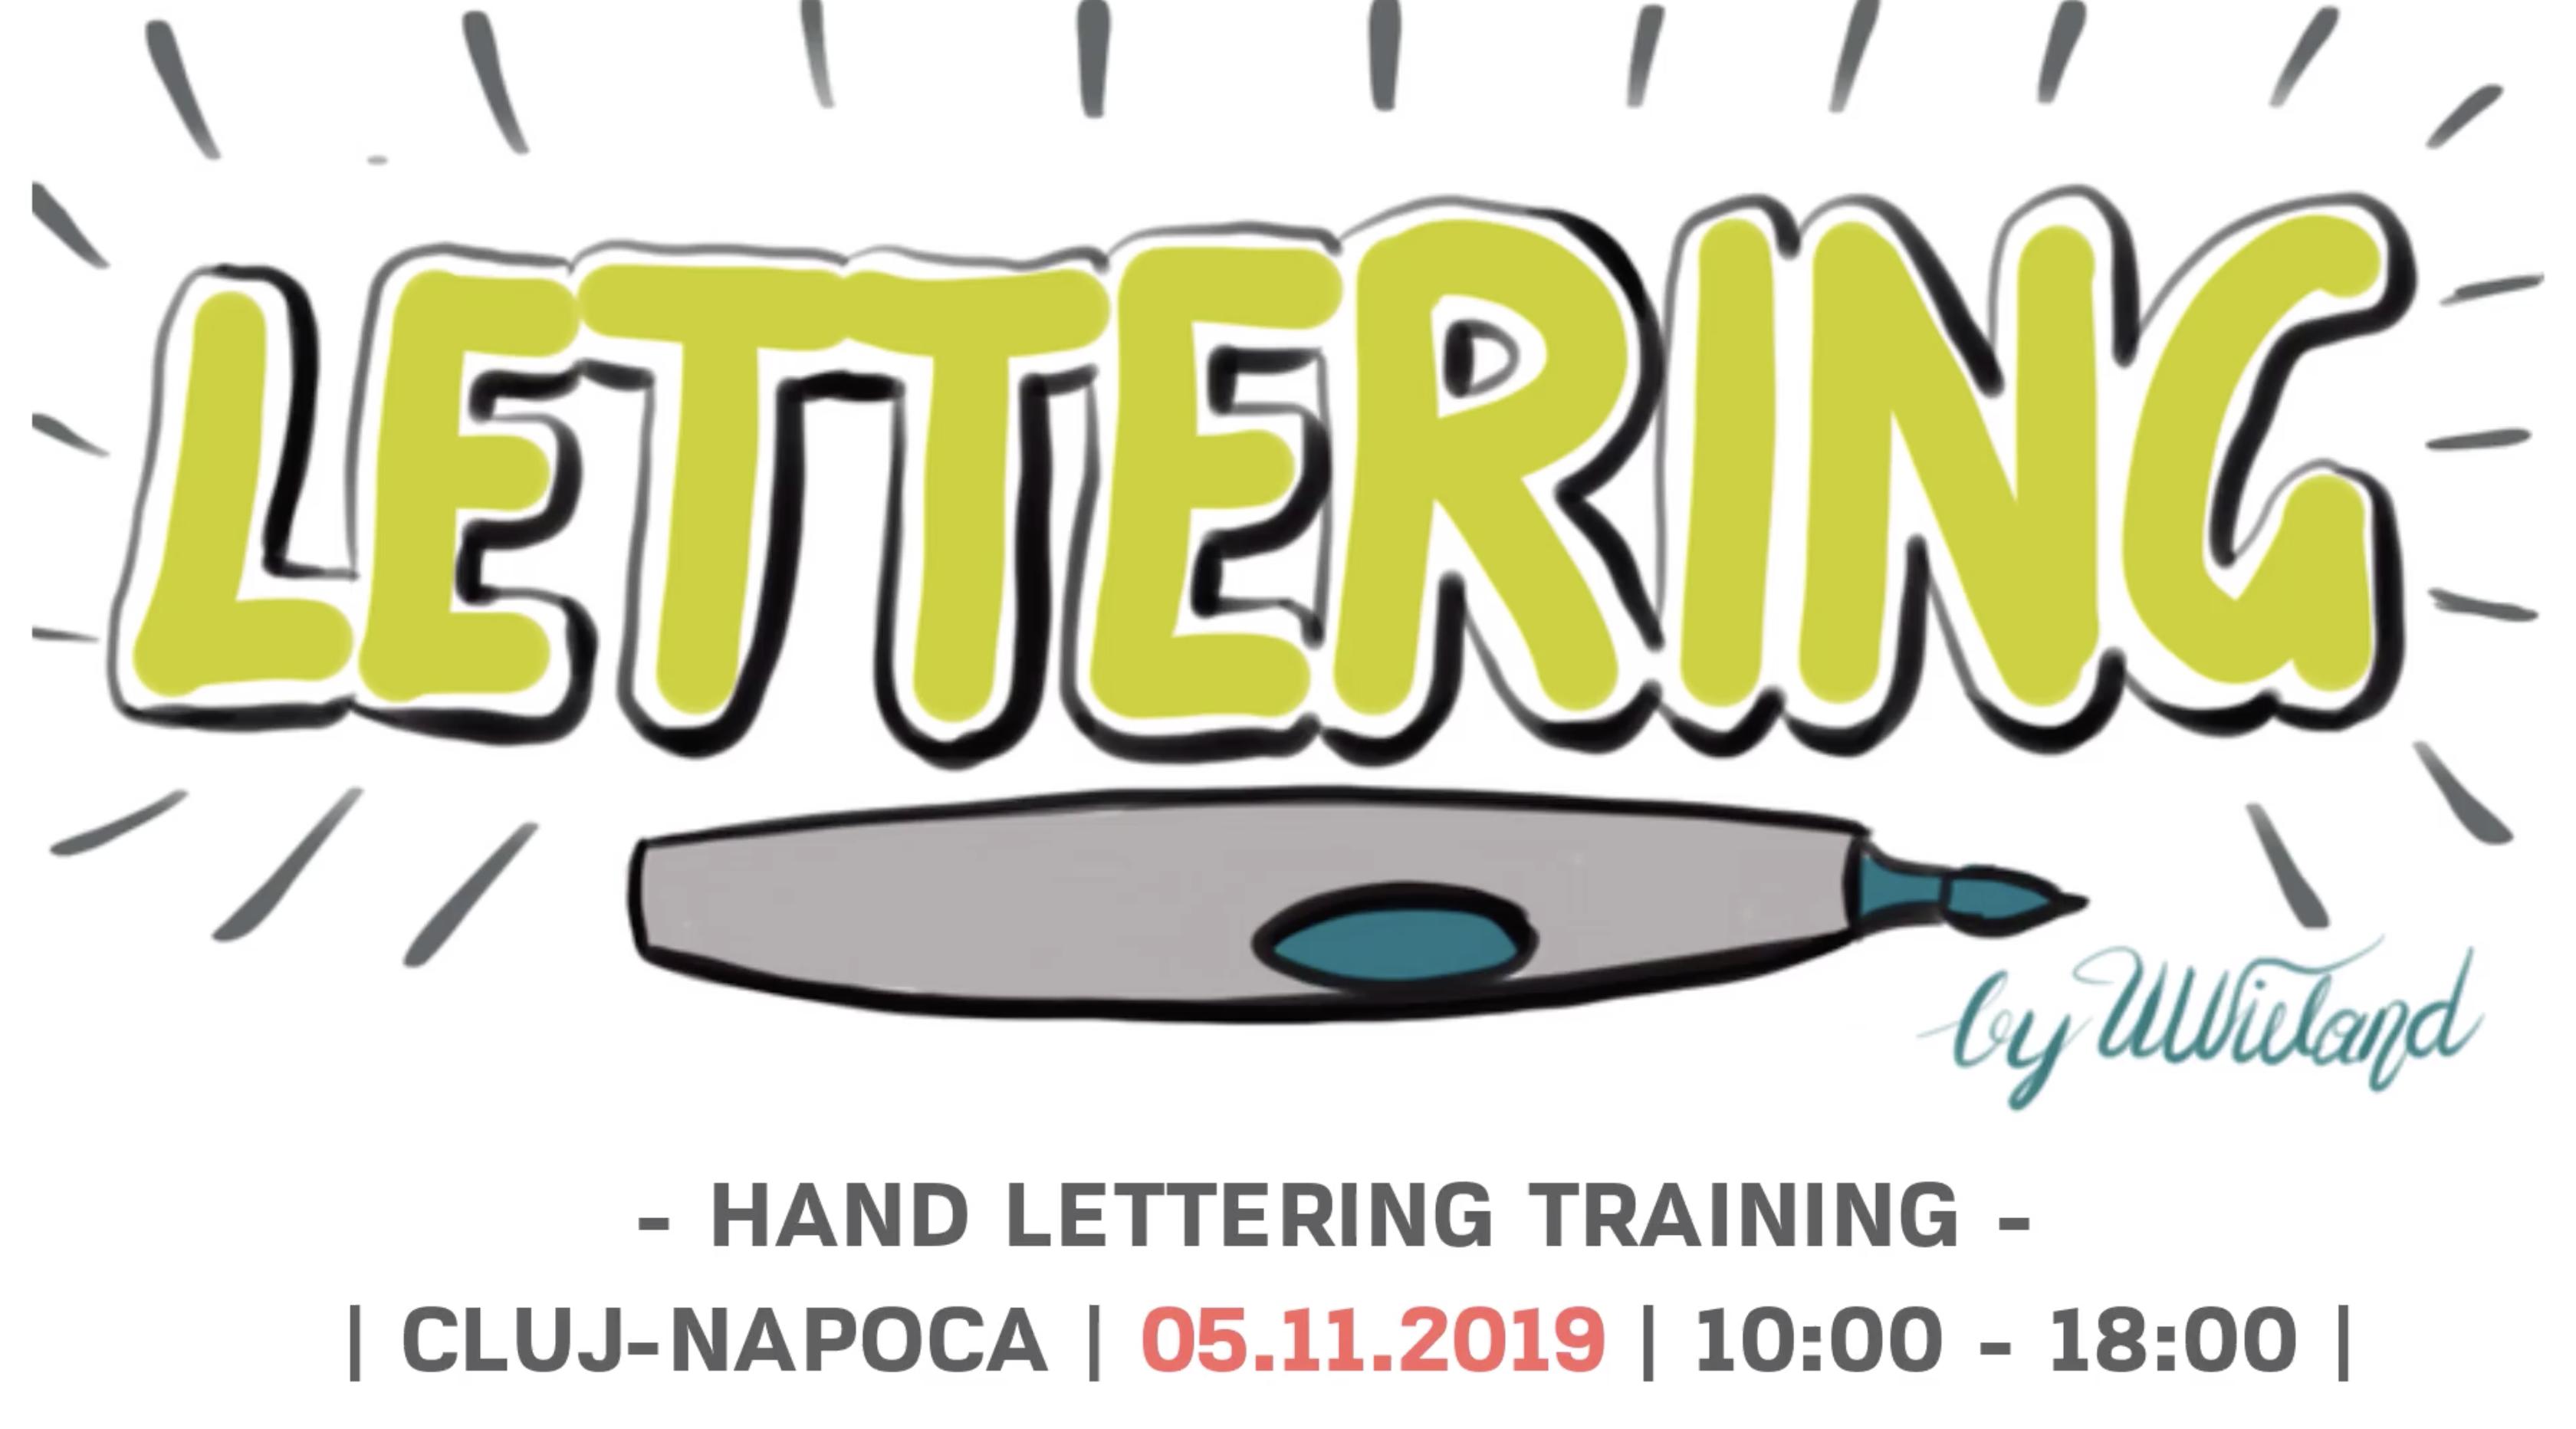 Hand Lettering Trainig